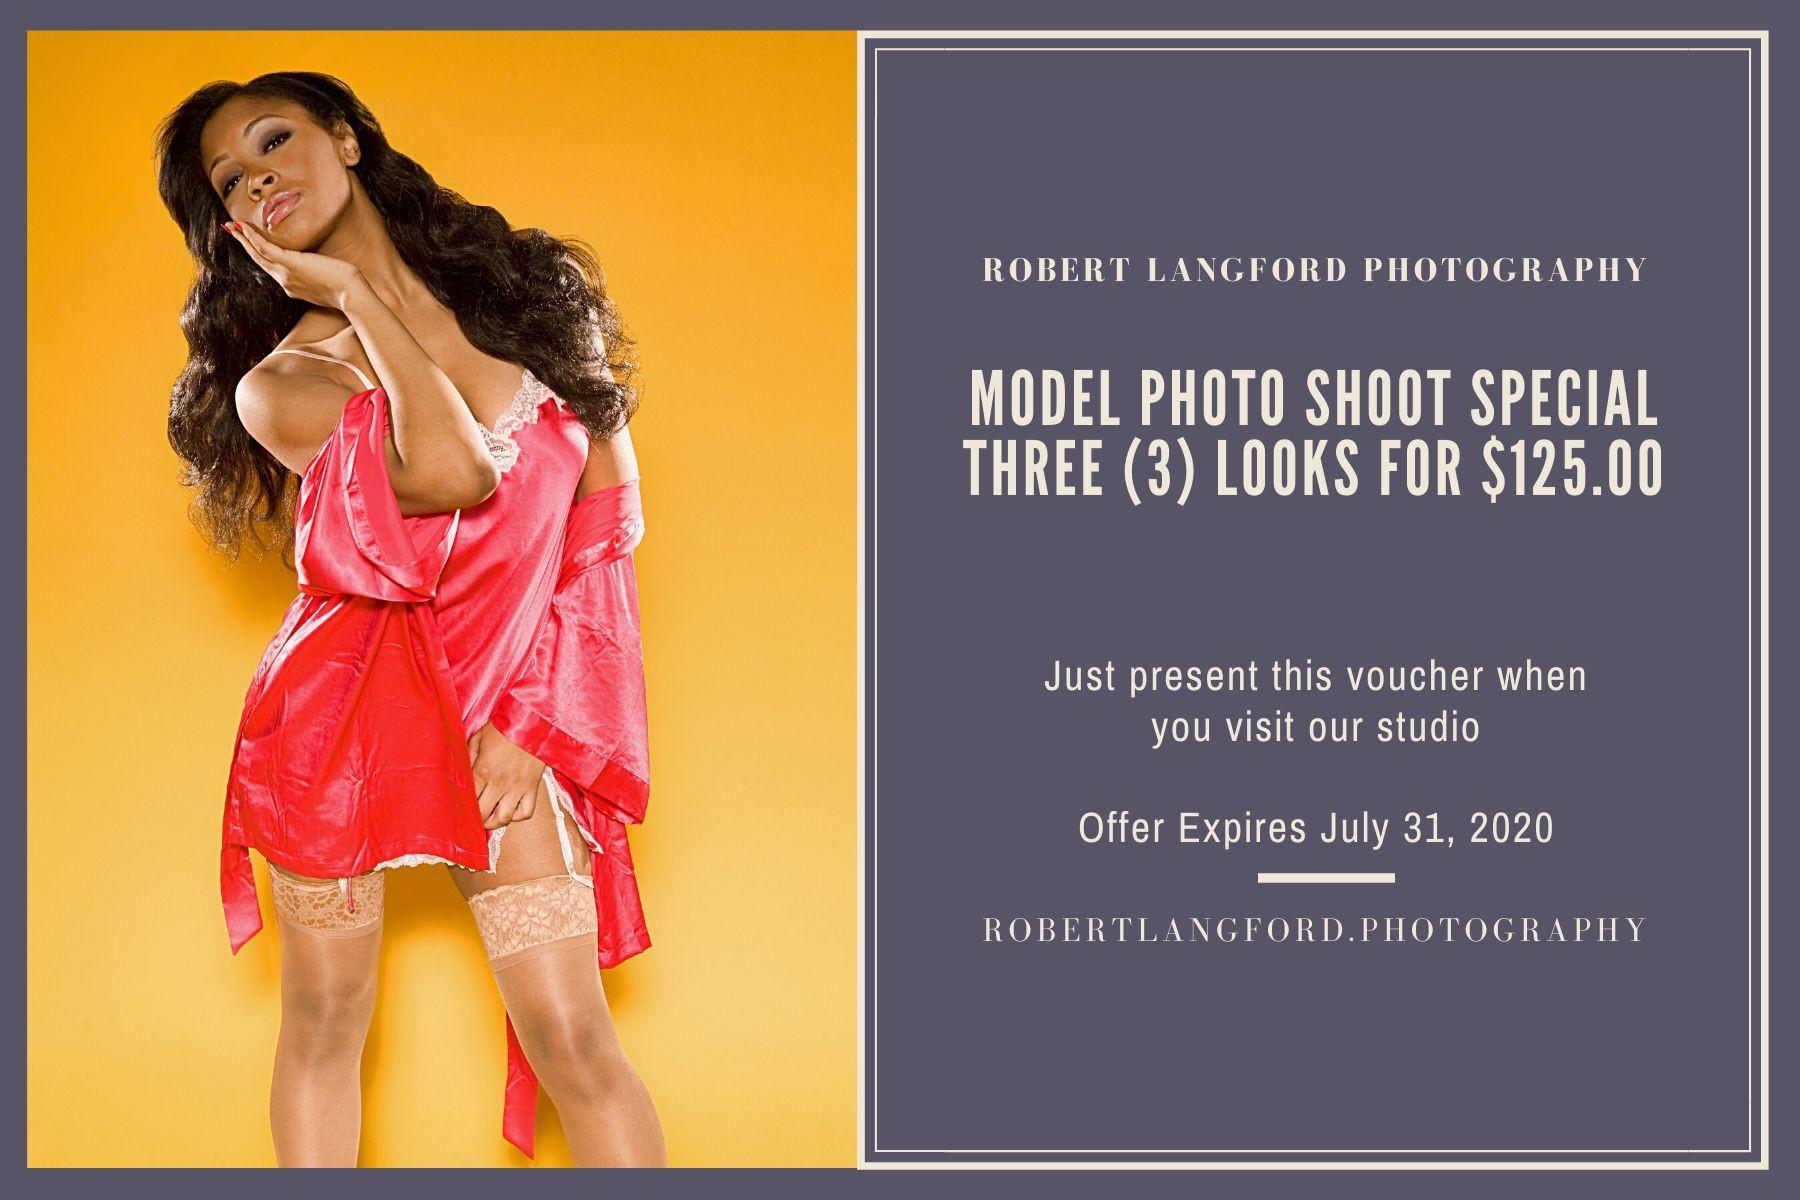 Model Photo Shoot Special